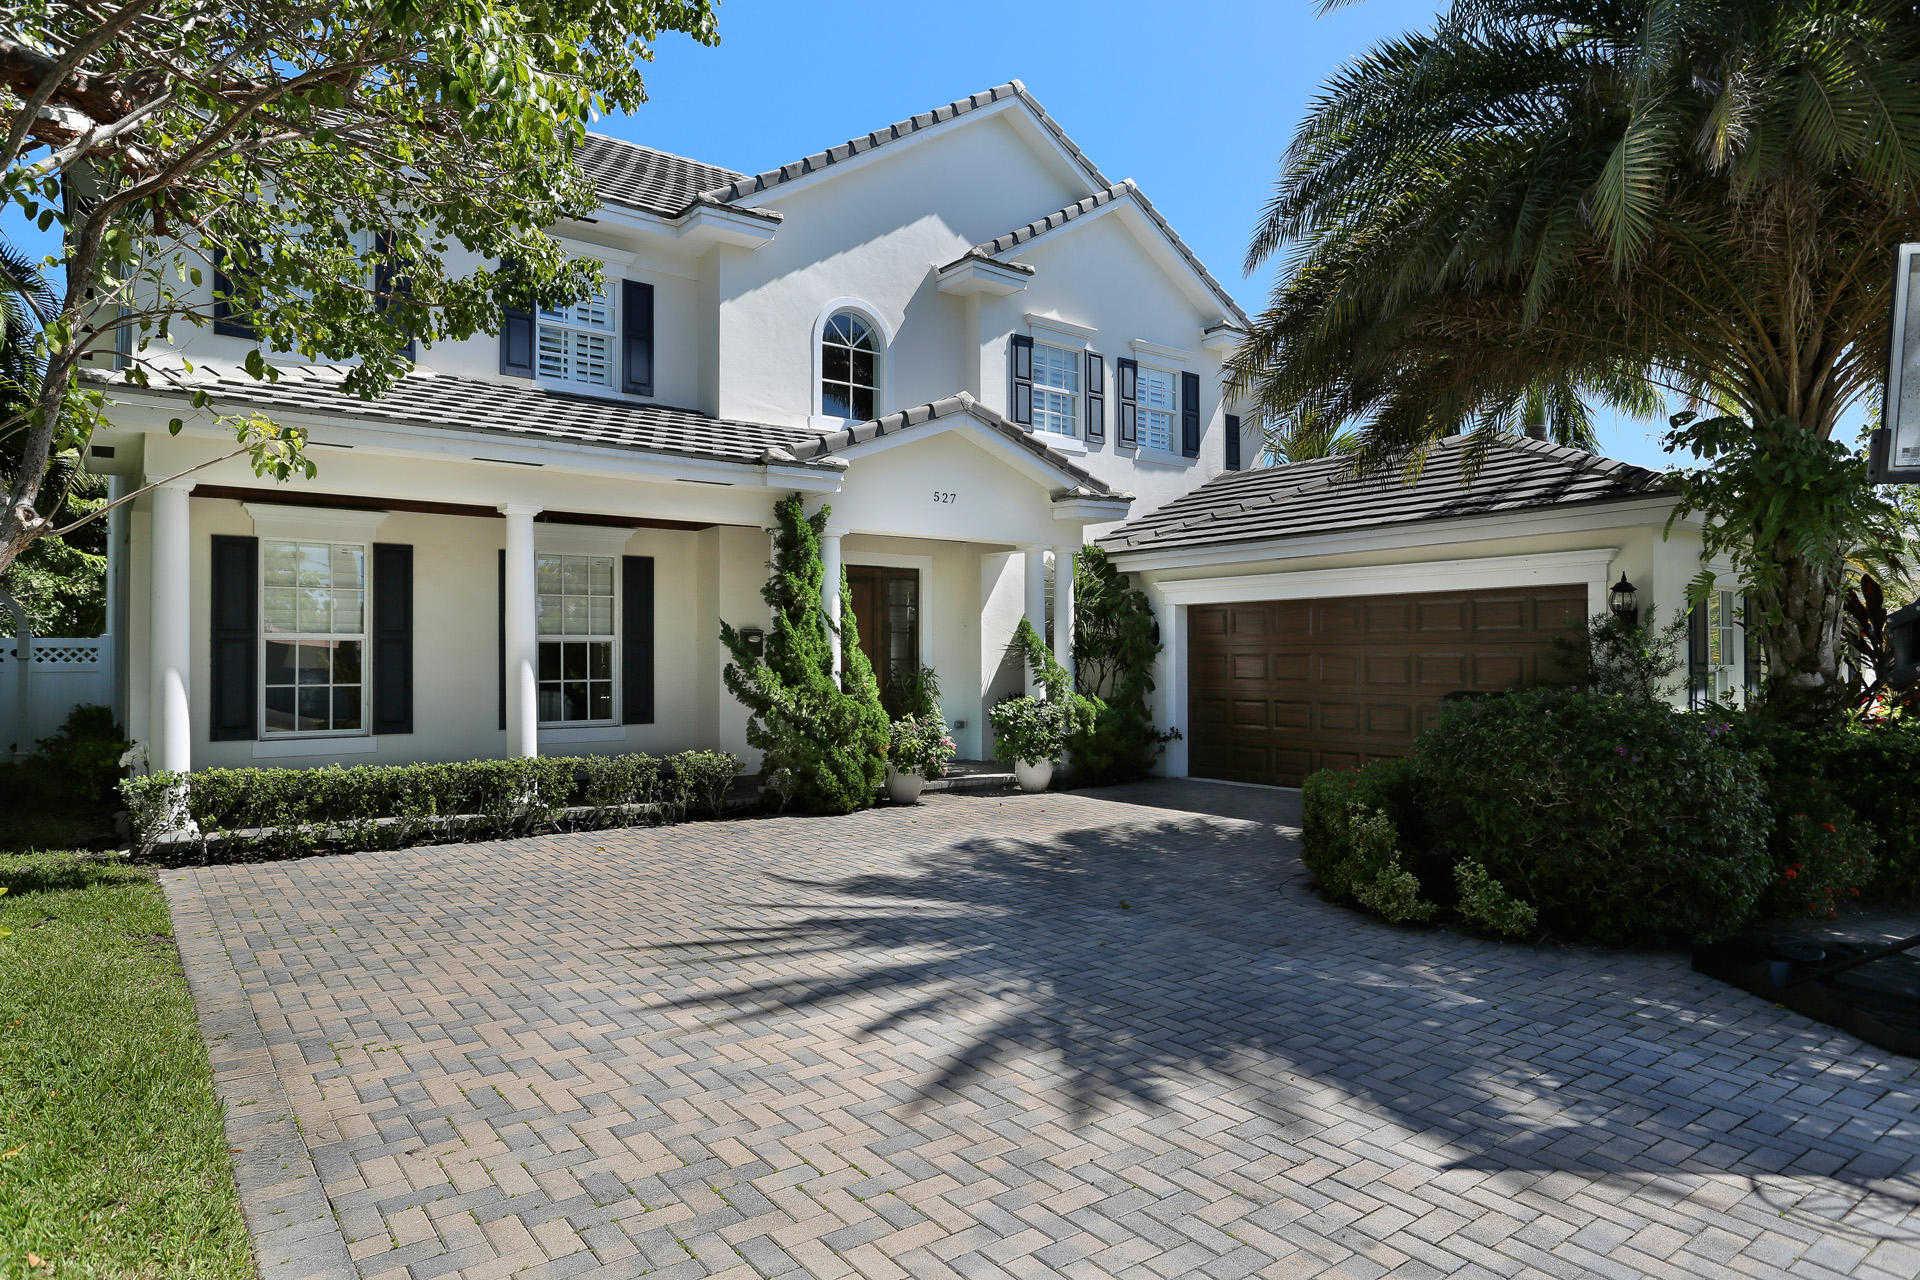 Lake Ida Homes For Sale Delray Beach Fl Real Estate